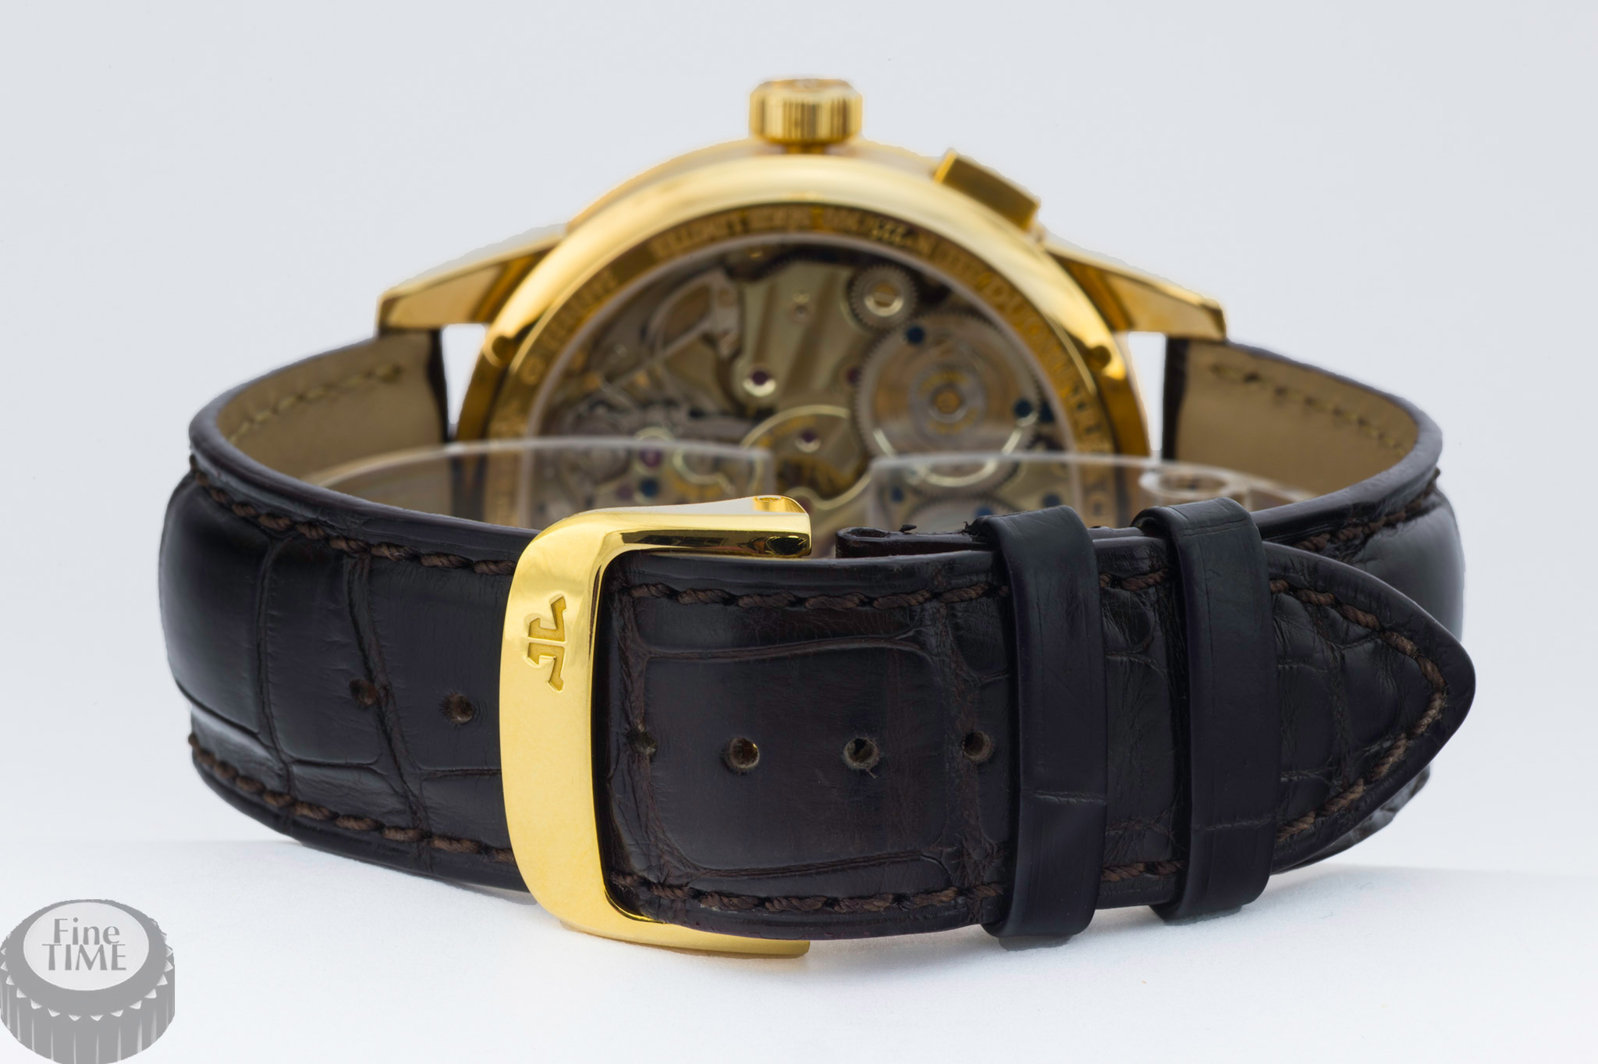 jaeger-lecoultre-duometre-chronographe-q6011420-03.jpg